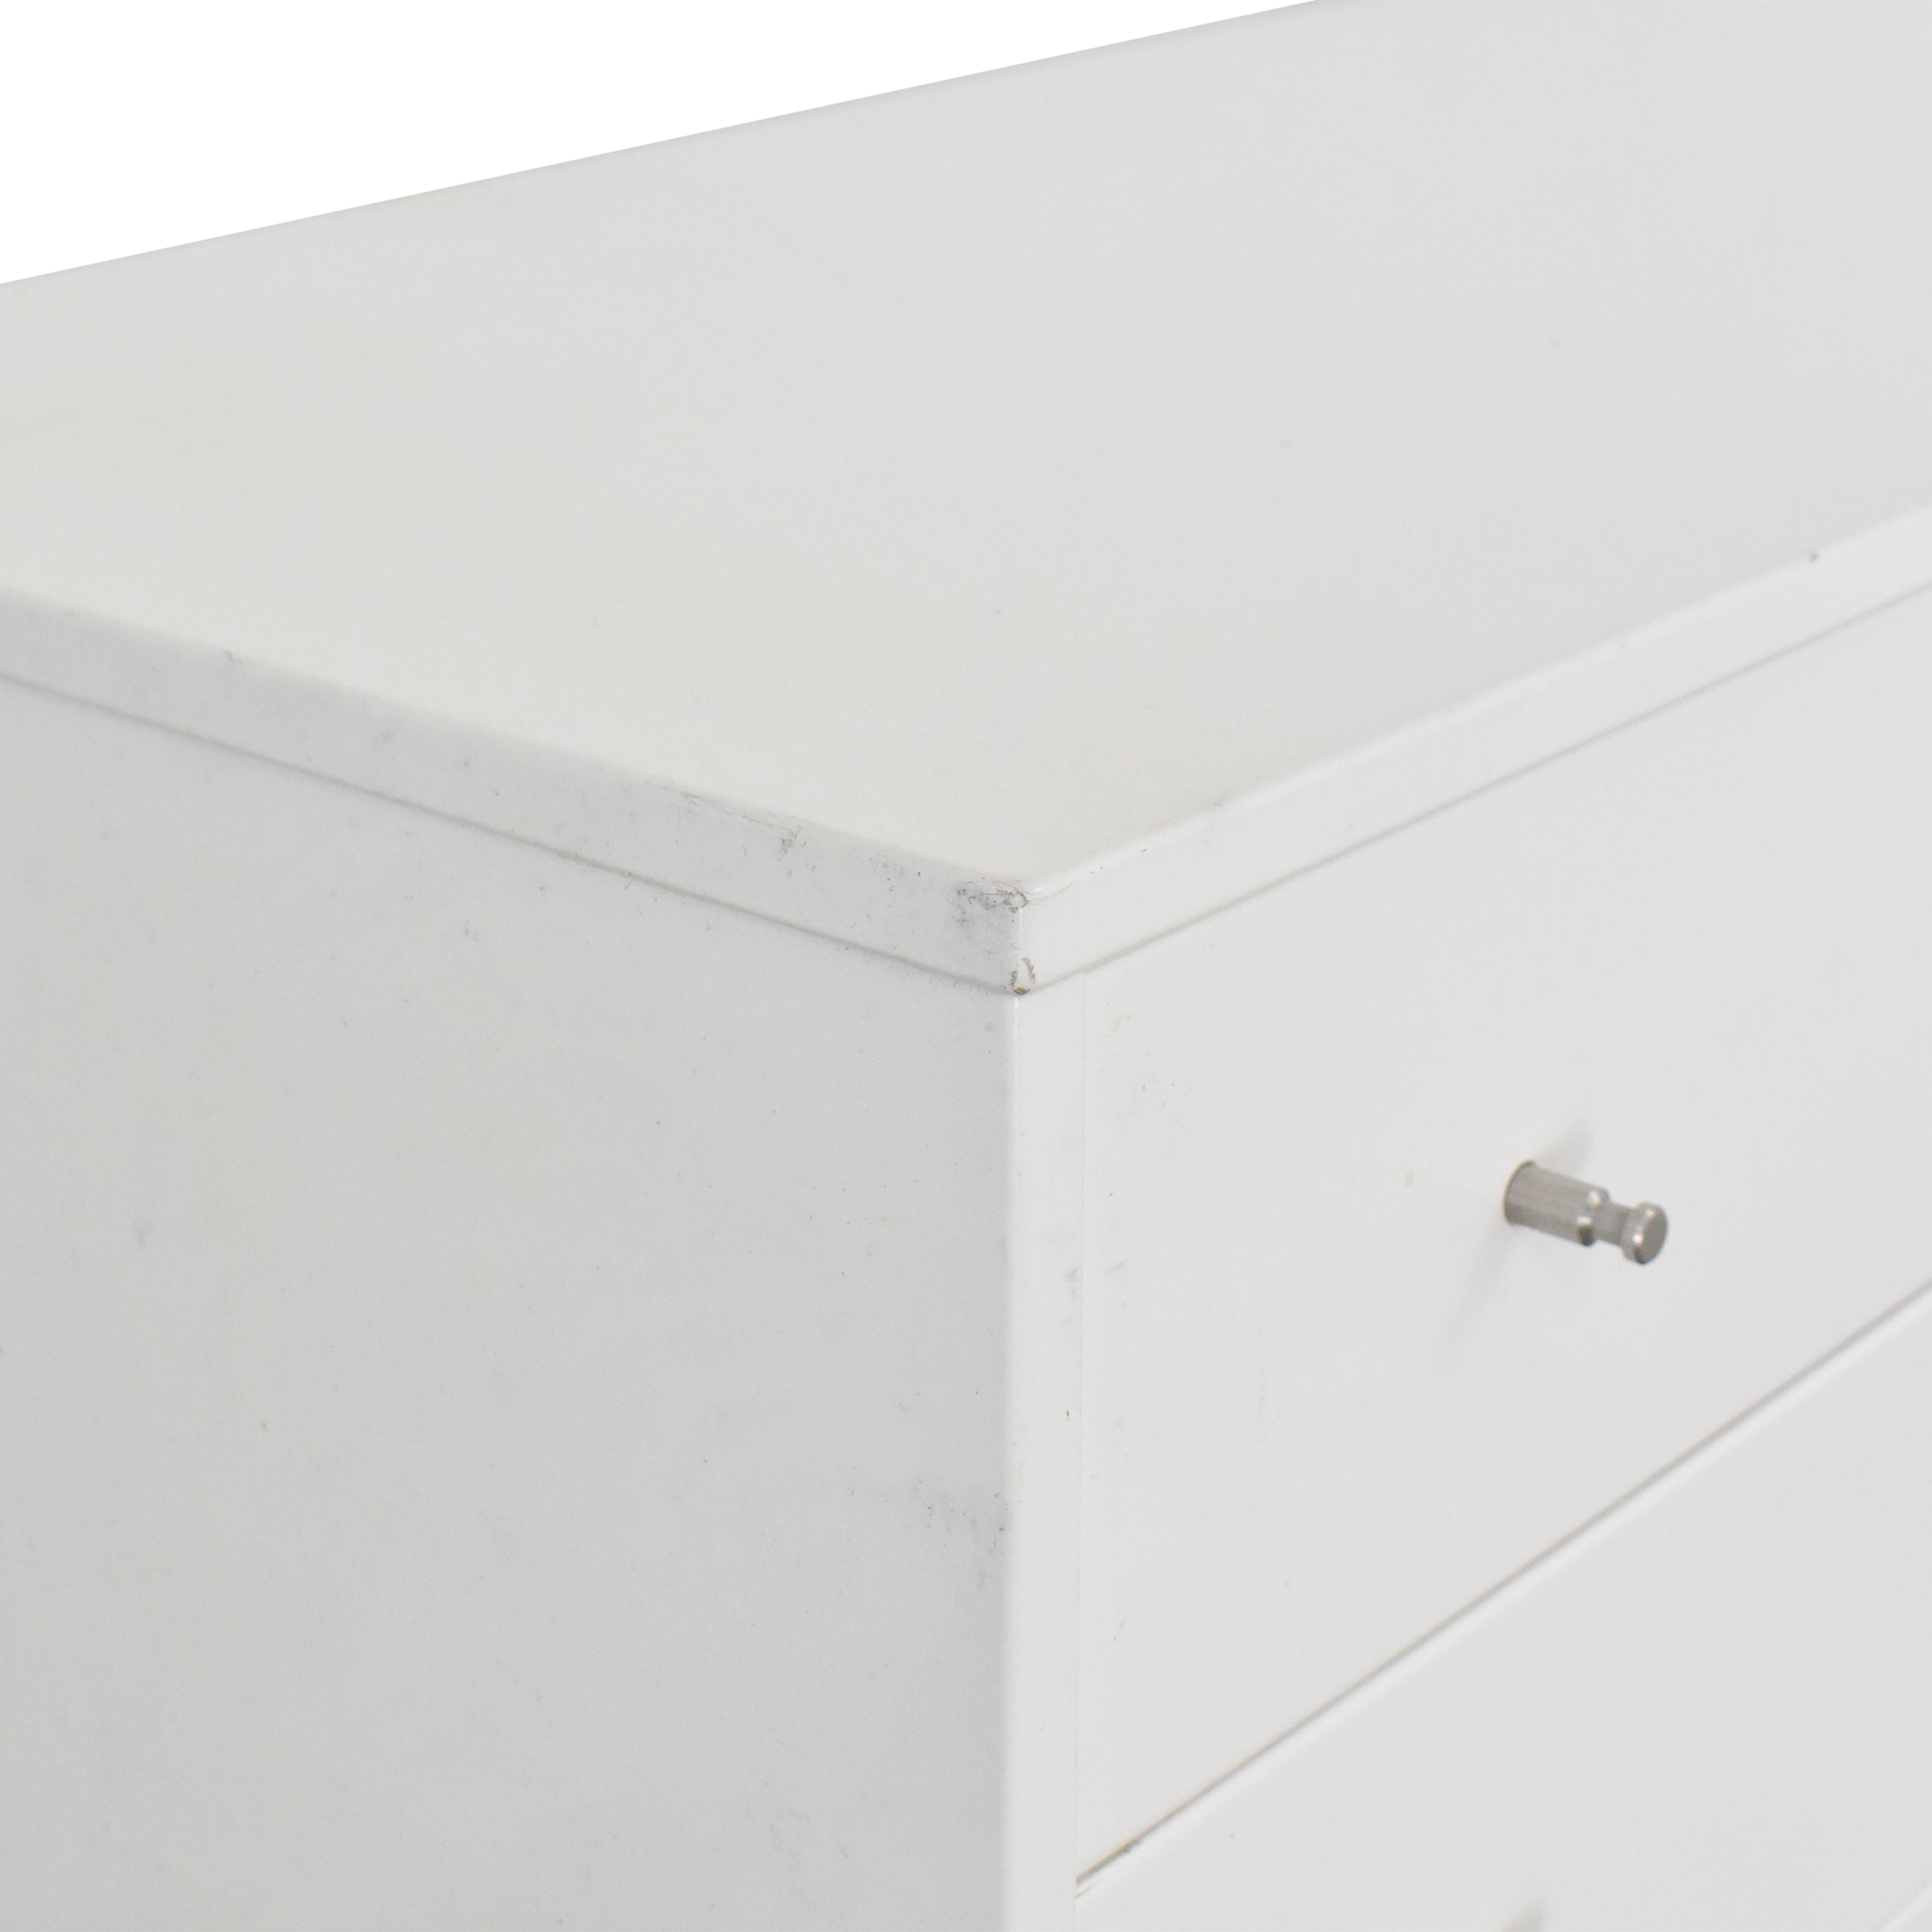 shop Room & Board Moda Eight Drawer Dresser Room & Board Dressers